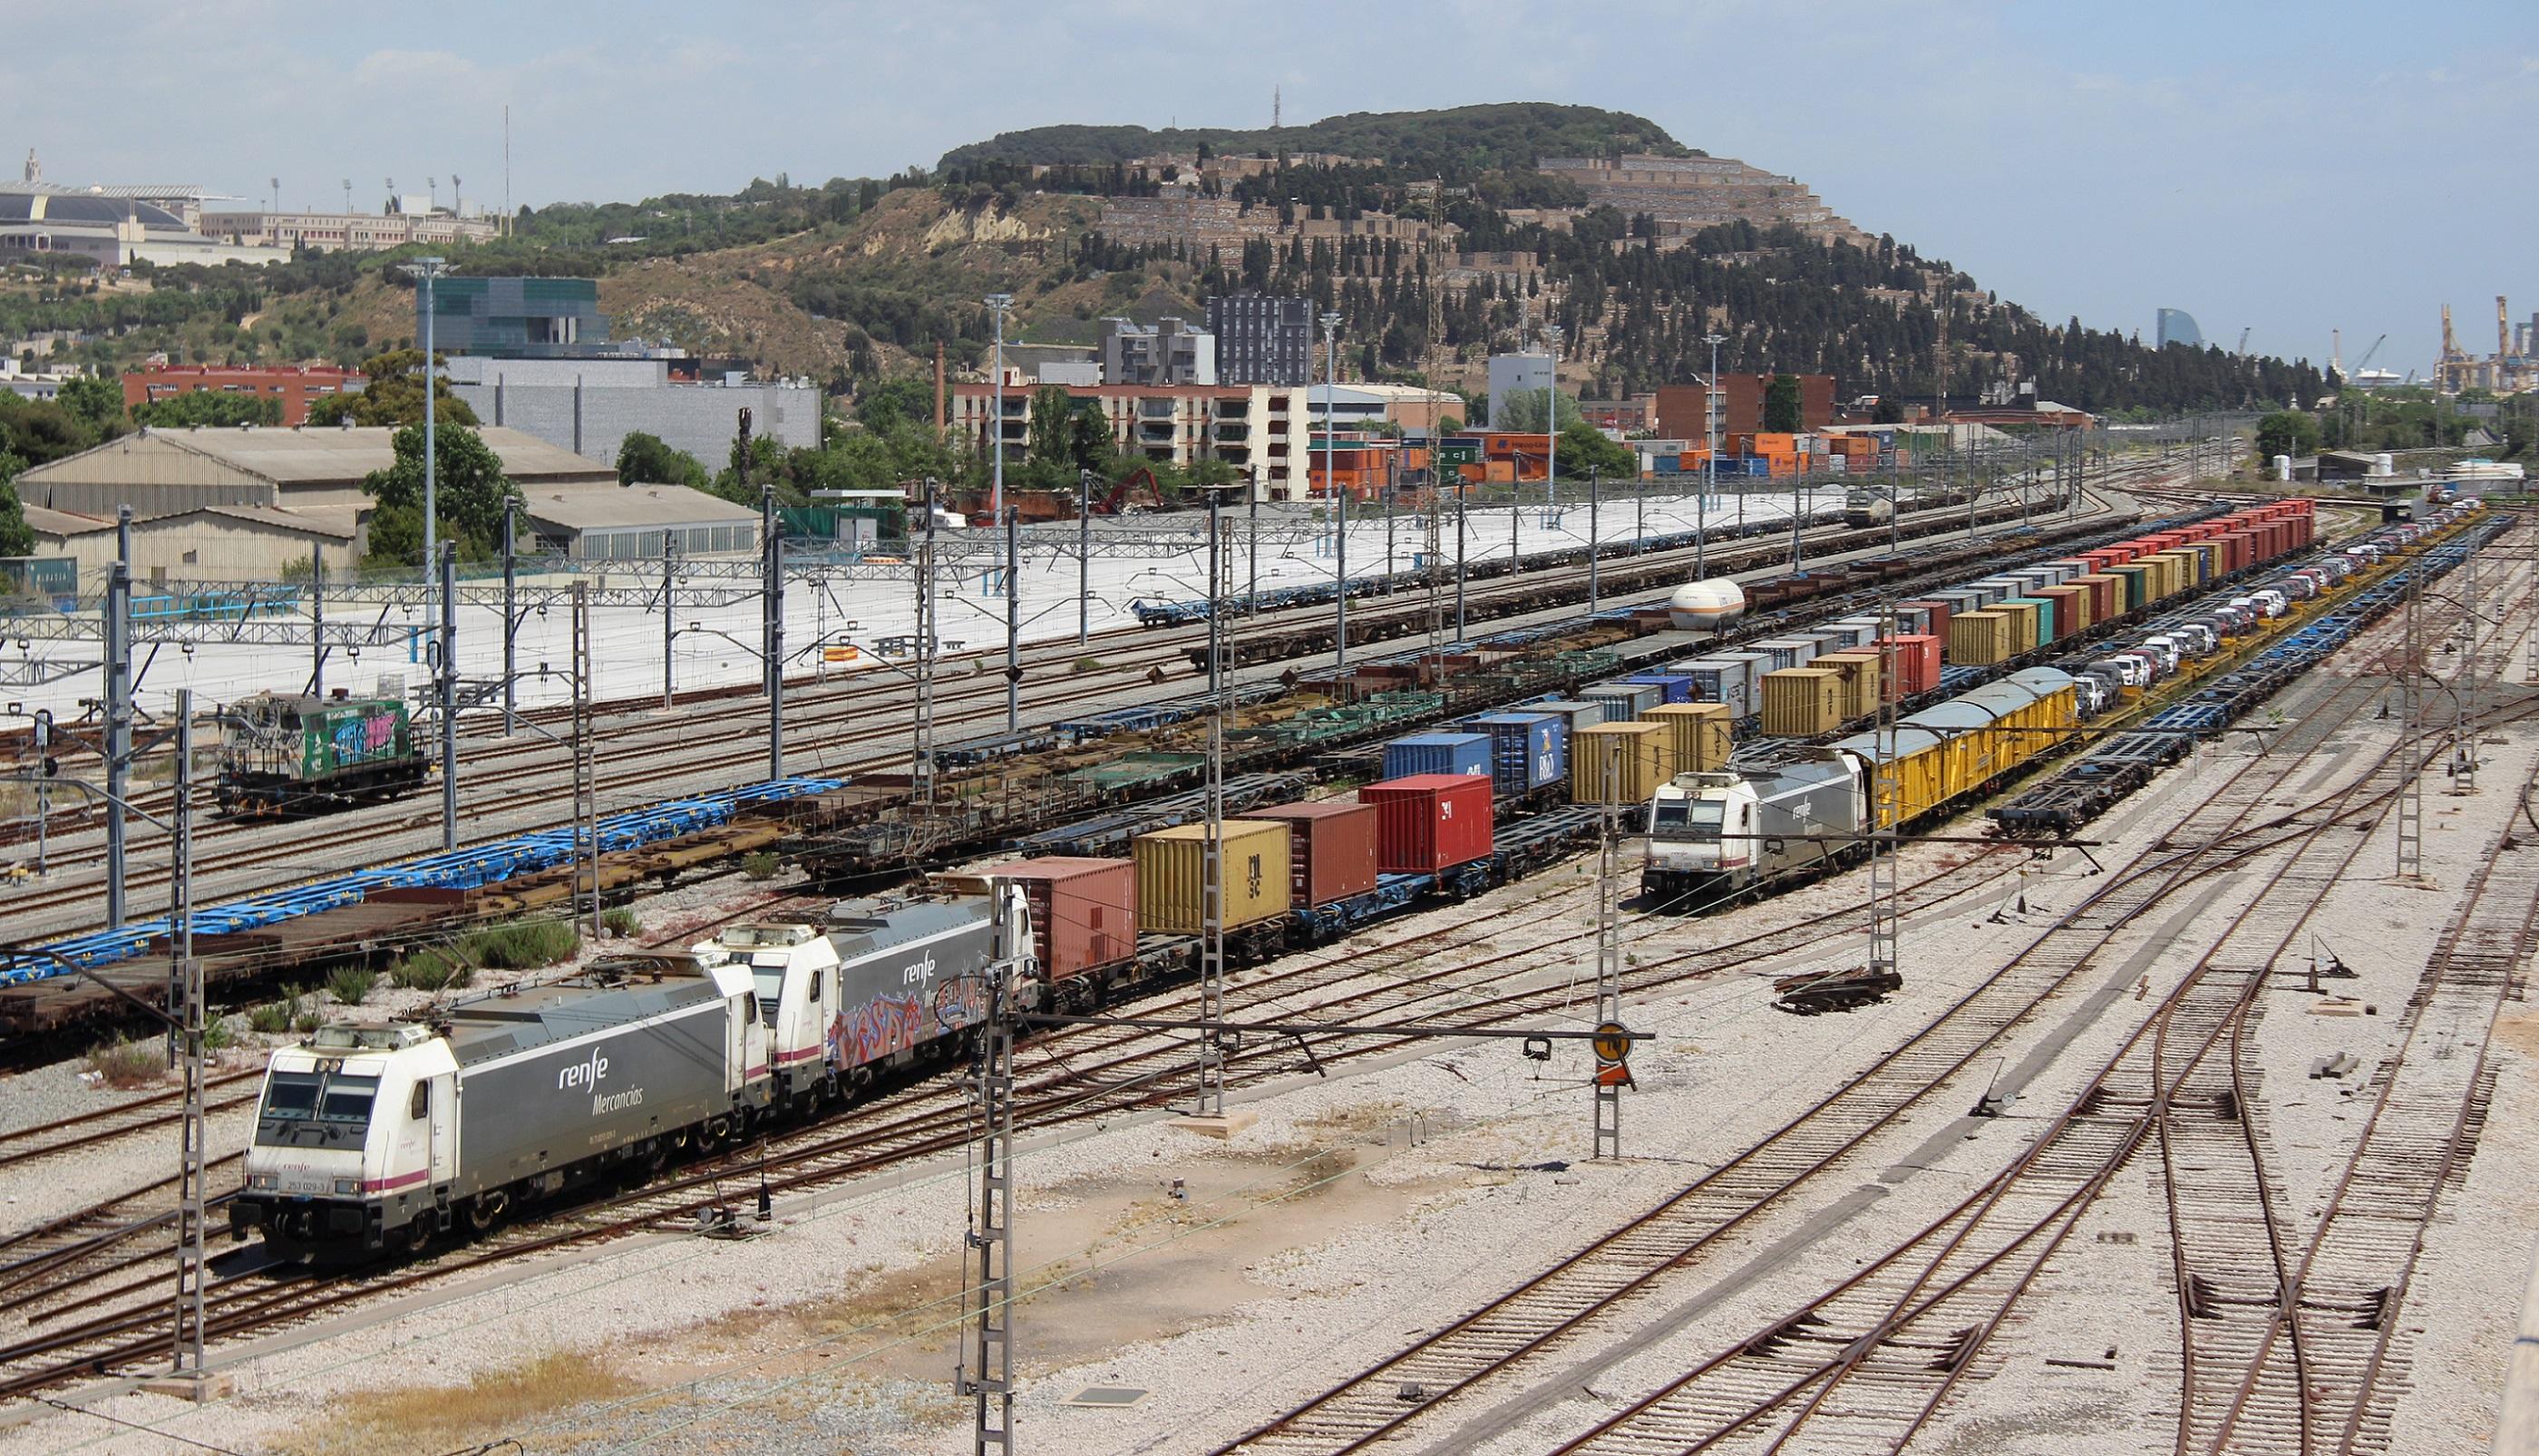 La terminal de mercancías de Barcelona-Can Tunis